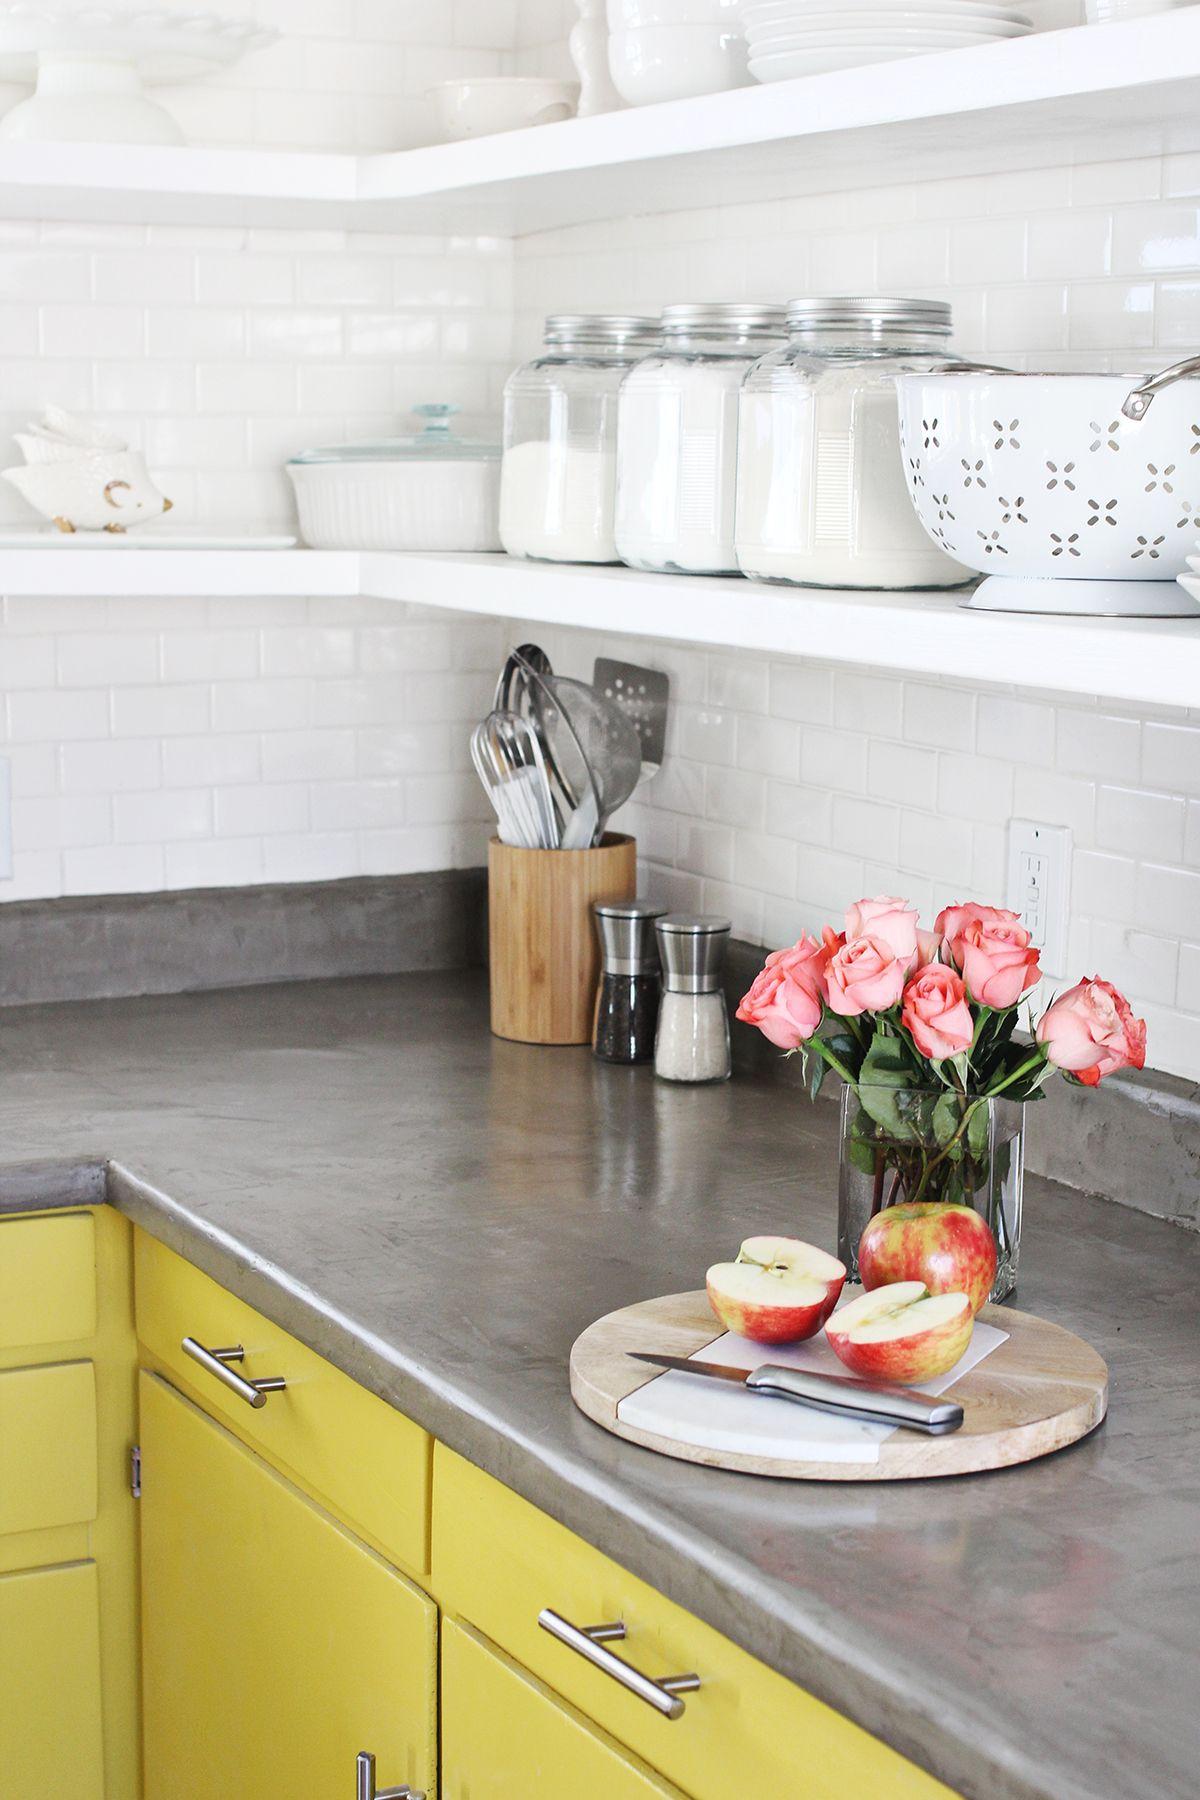 Concrete Countertop Diy A Beautiful Mess Concrete Countertops Kitchen Diy Countertops Concrete Kitchen